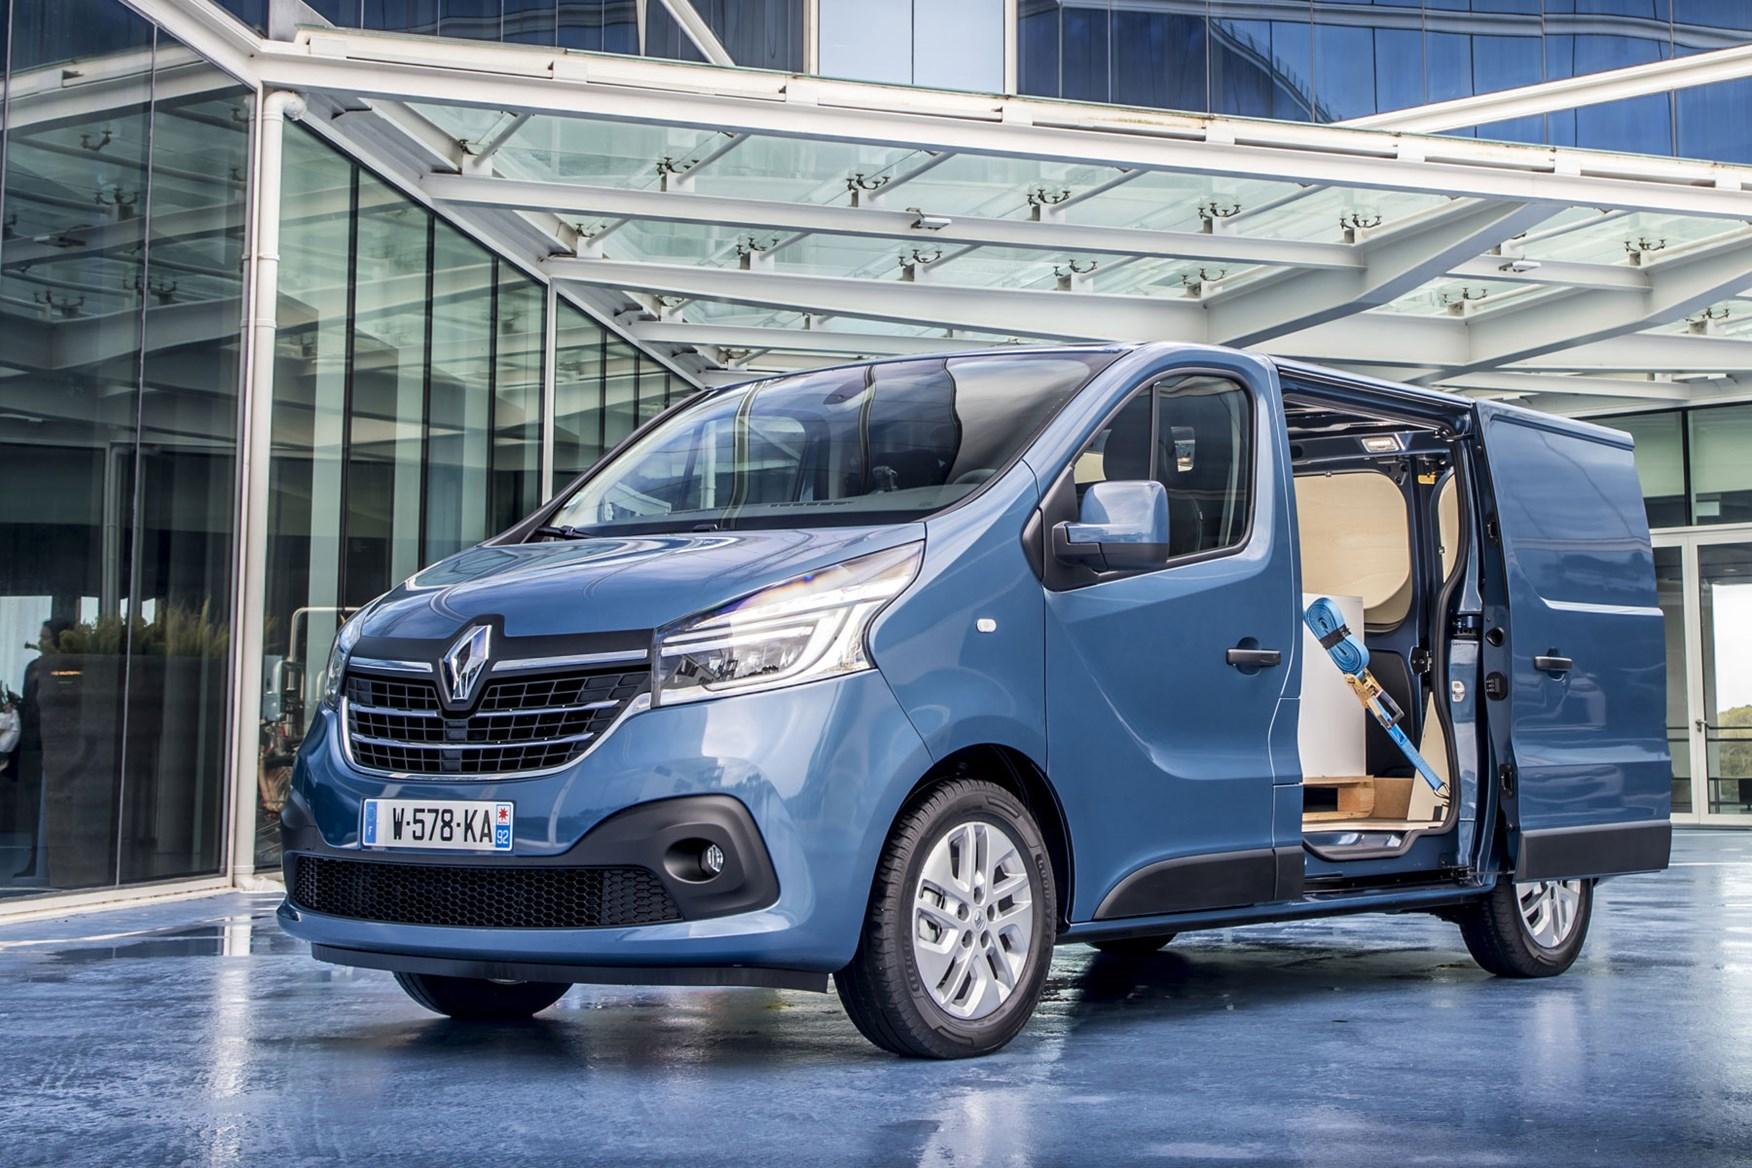 Renault Trafic van dimensions (2014-on), capacity, payload ...